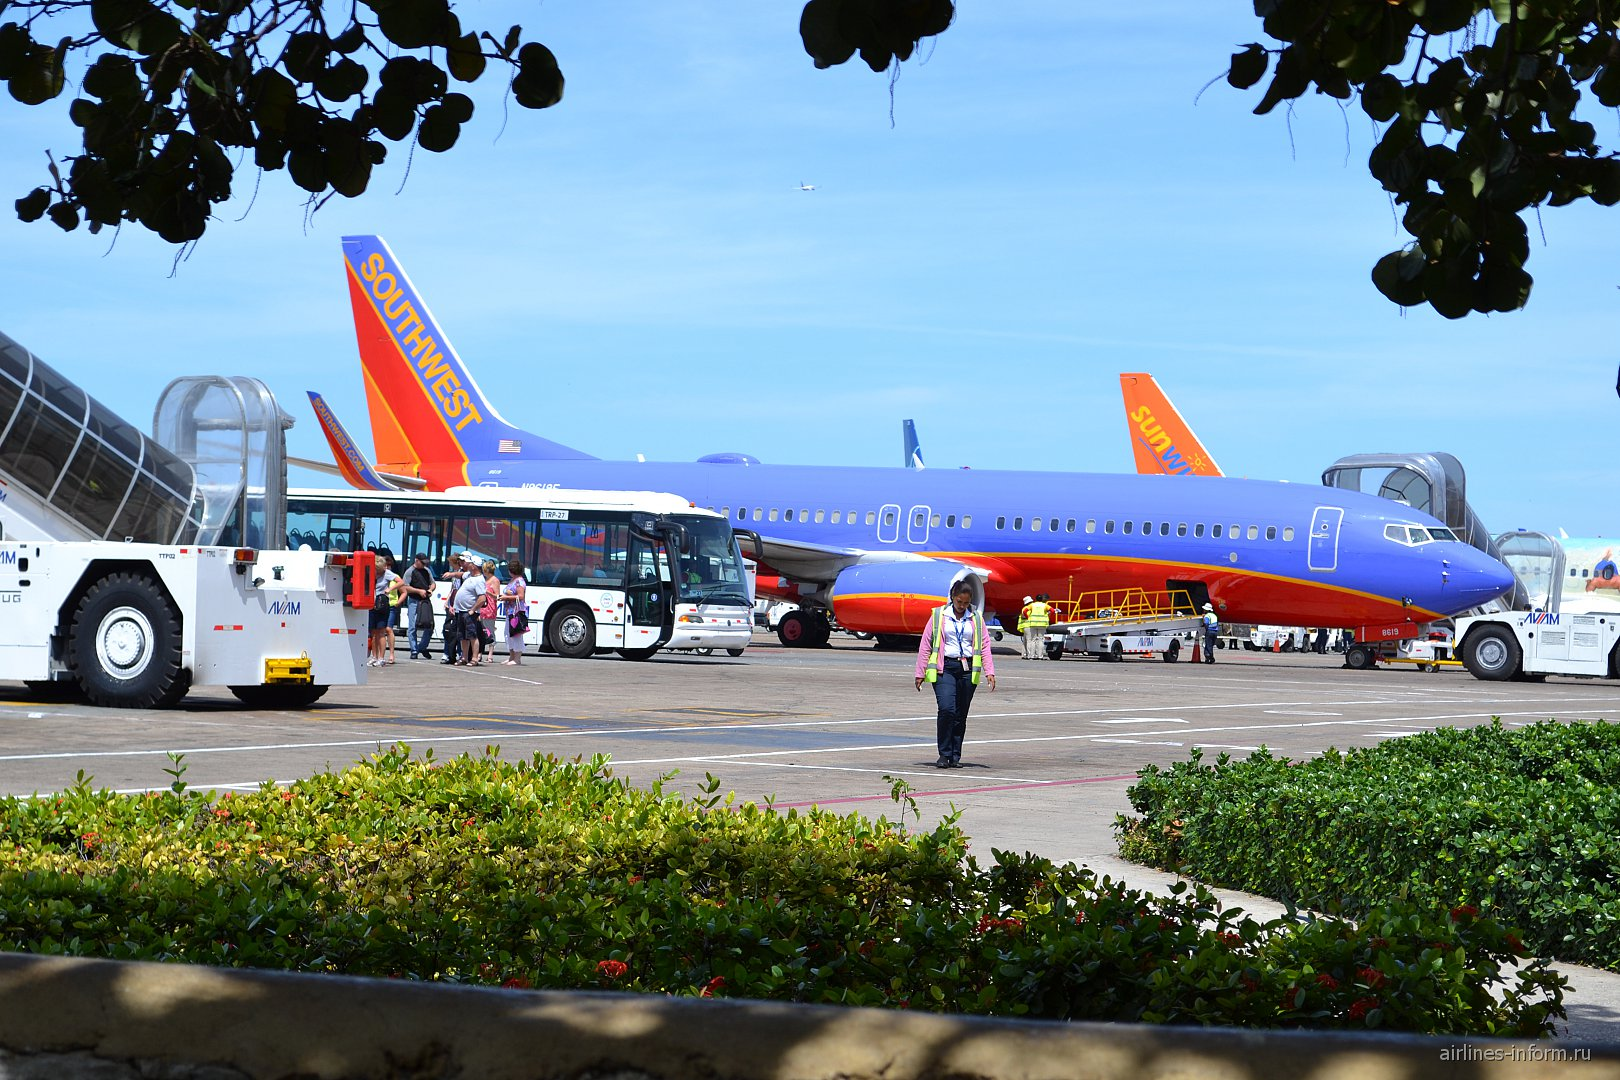 Боинг-737-800 авиакомпании Southwest в аэропорту Пунта-Кана